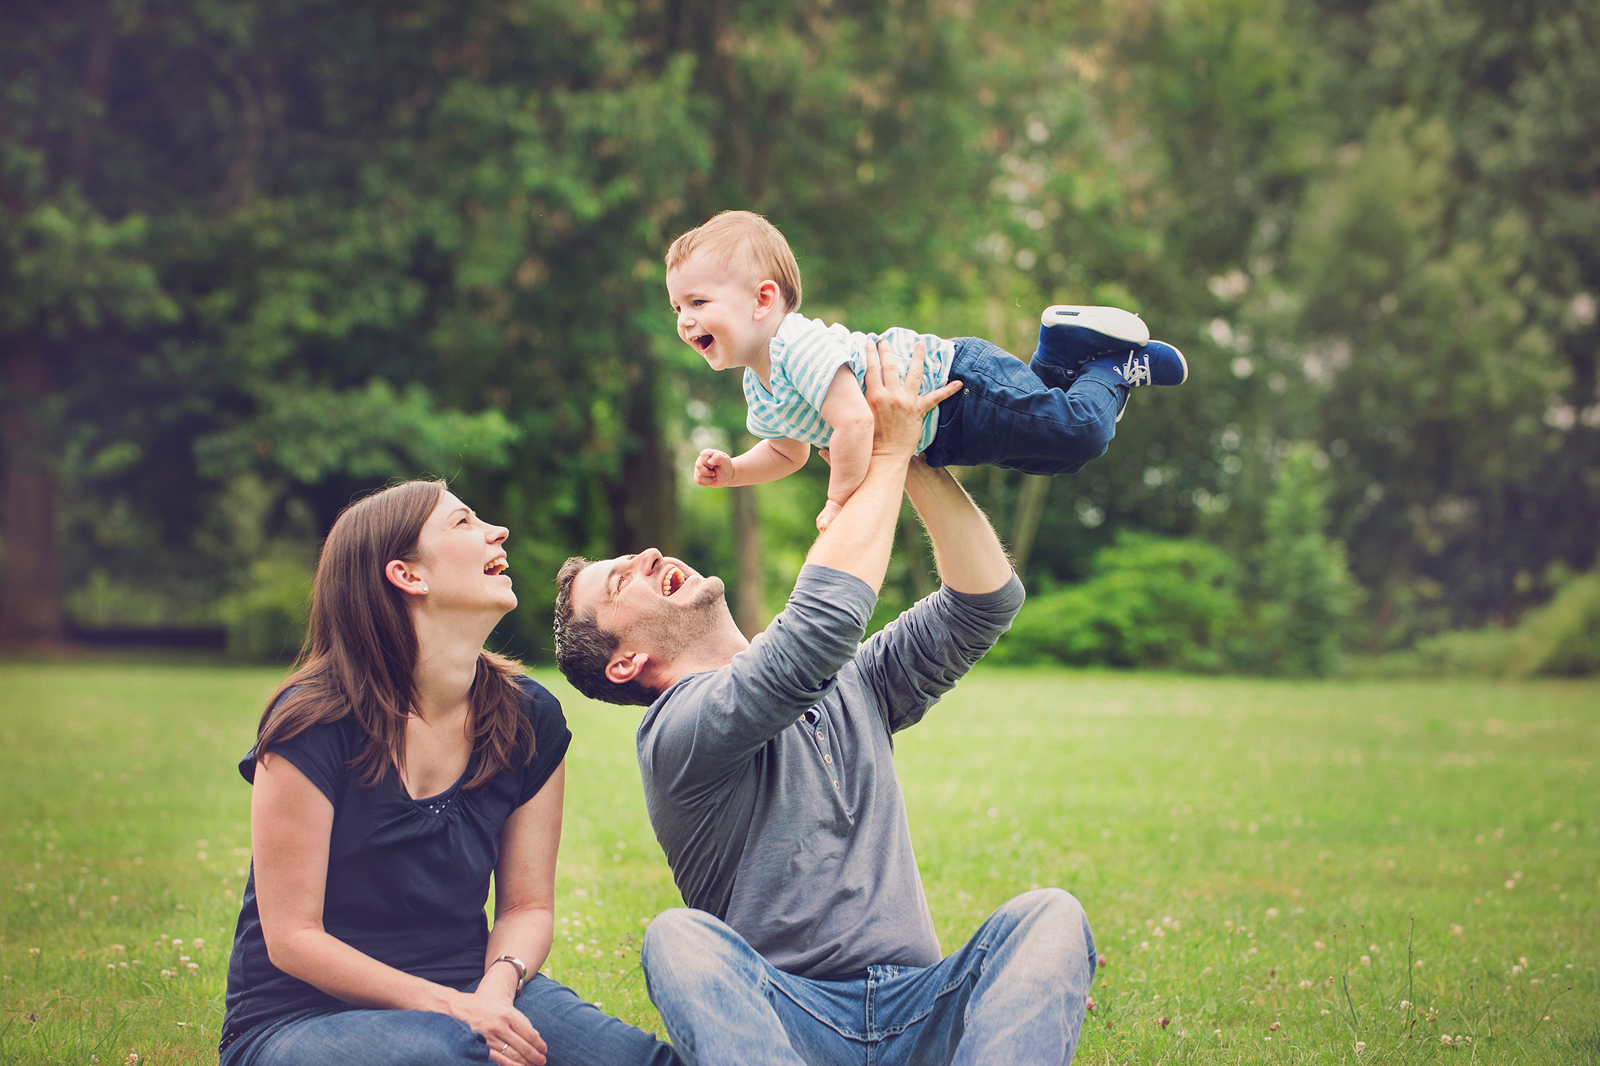 Kinderfotografie, Familienfotografie